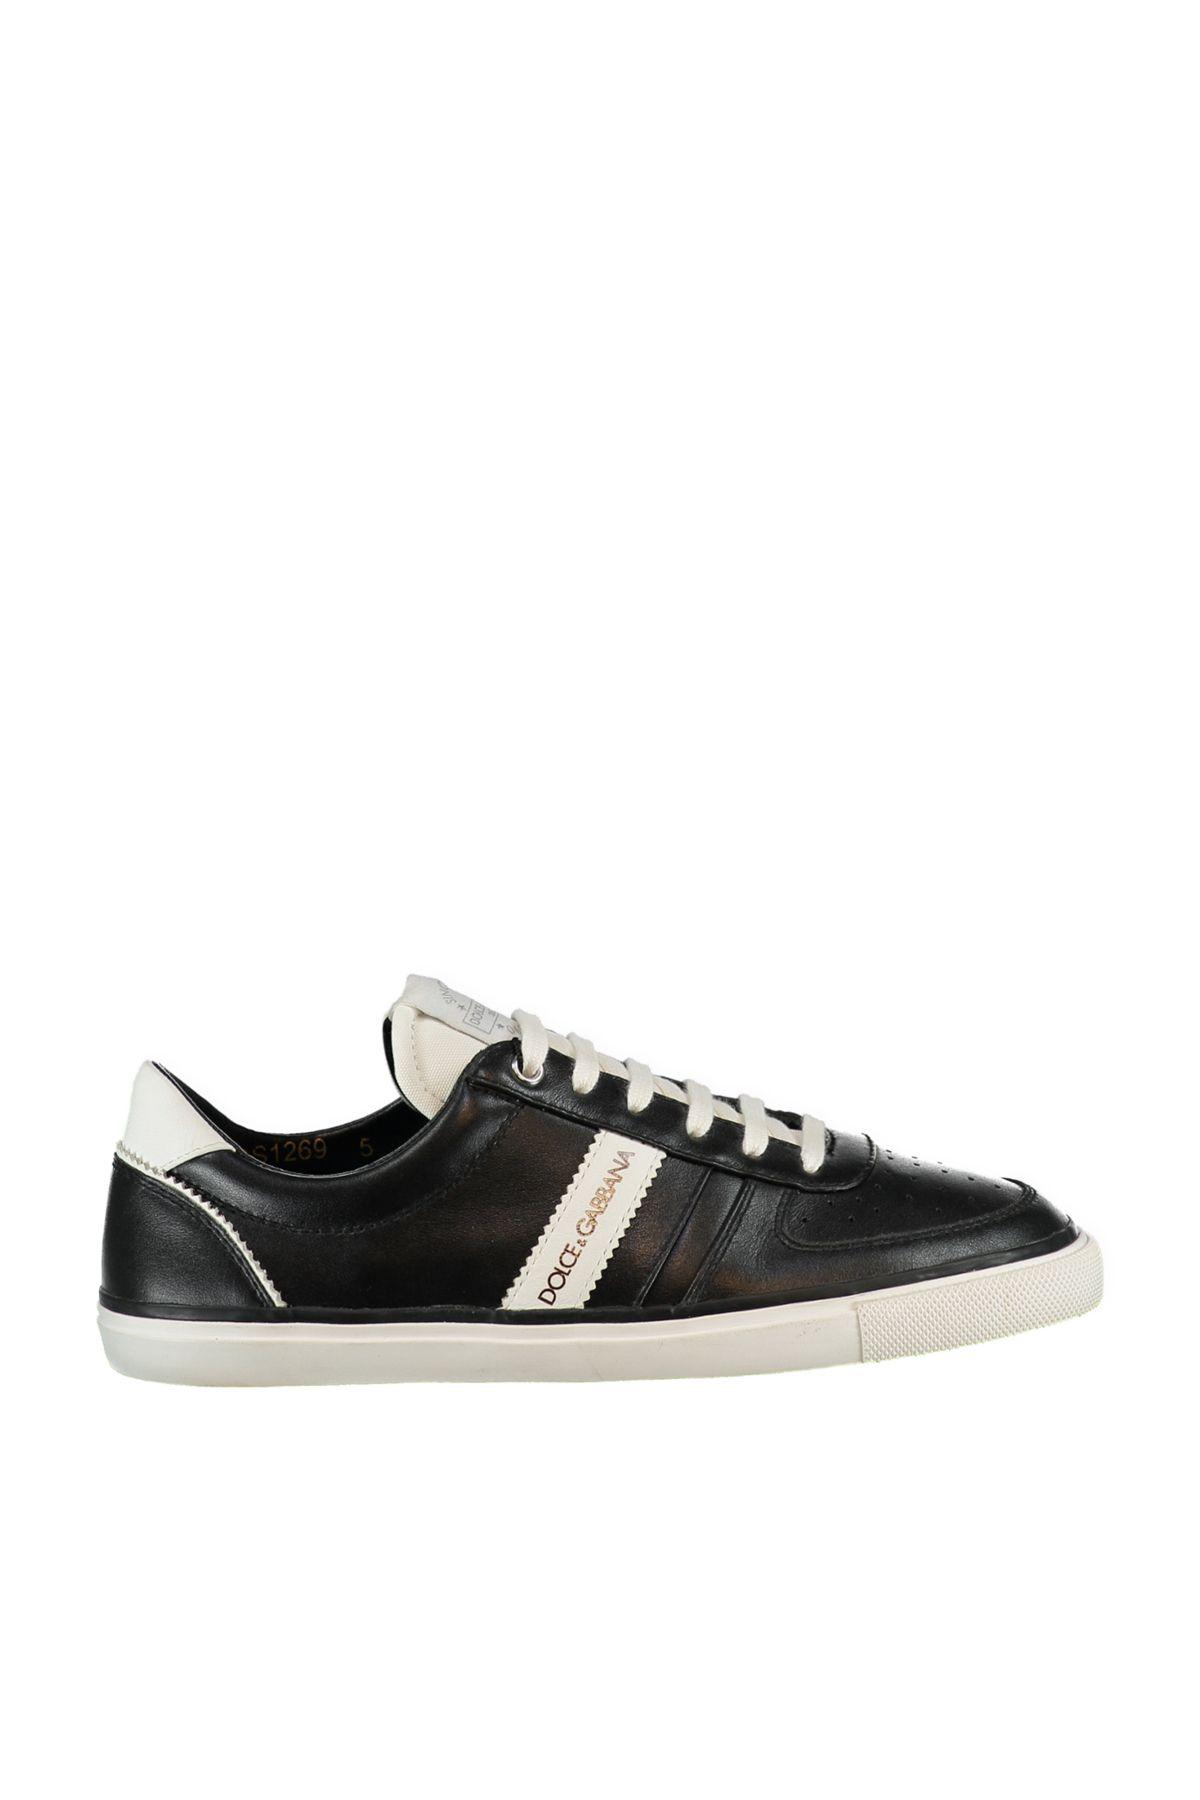 wholesale dealer 73522 d5e5d Dolce   Gabbana - Dolce gabbana Erkek Sıyah Ayakkabı Fashion Advisor, Brand  Store, Fashion Styles